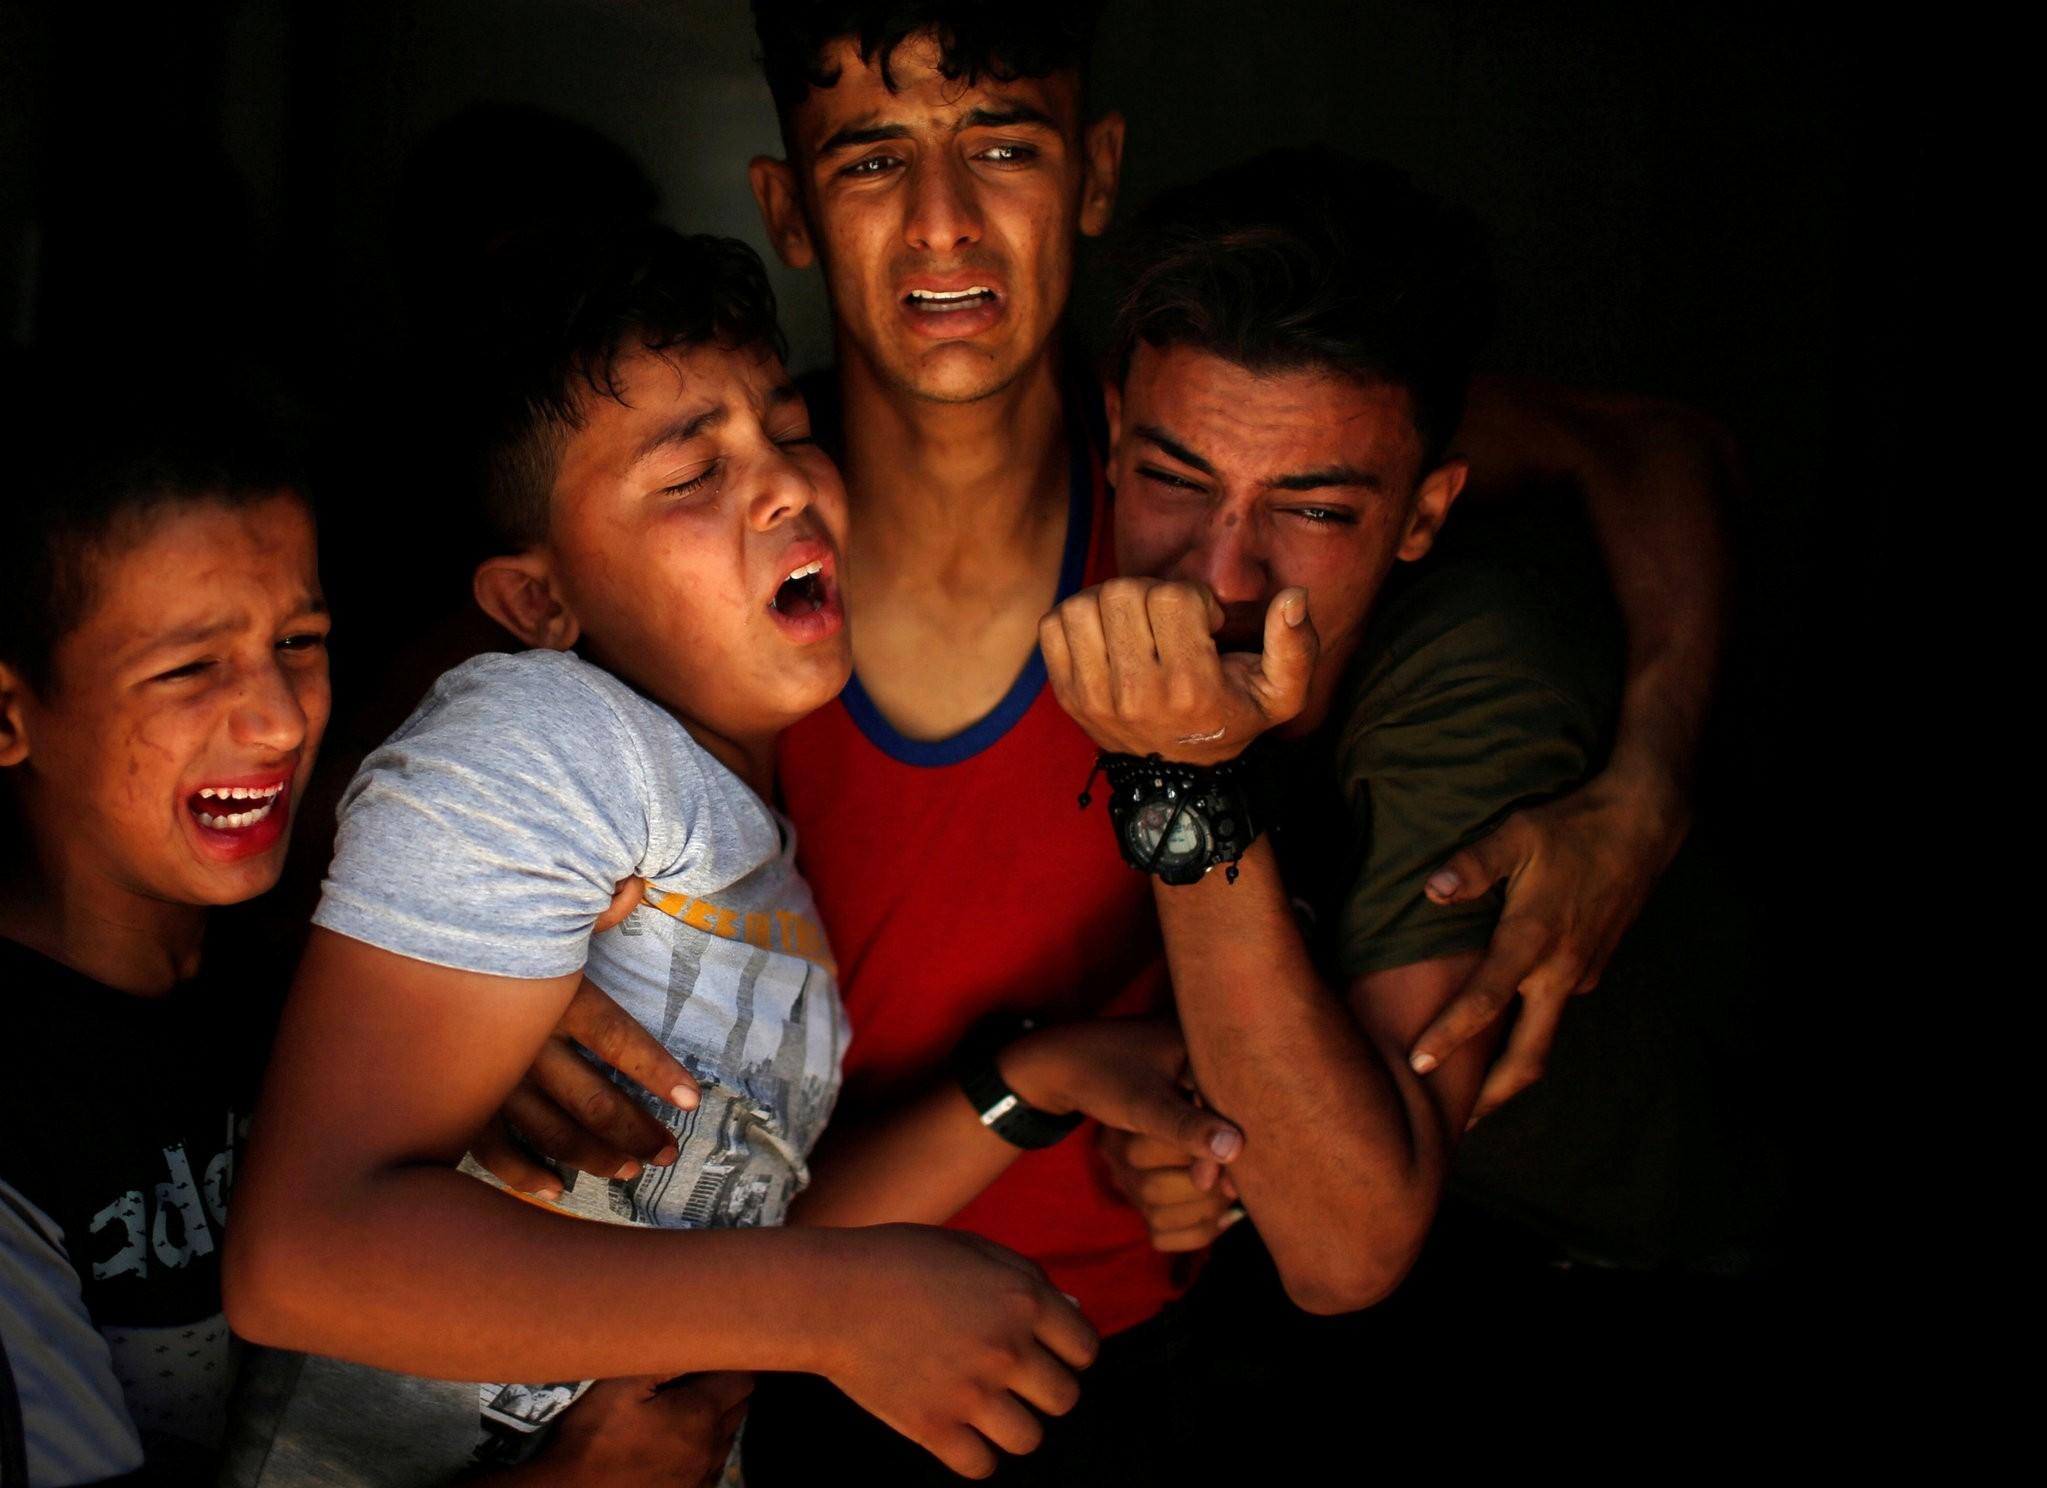 Relatives of a Palestinian, who was killed at the Israel-Gaza border, react at a hospital in Gaza City June 18, 2018. (Reuters Photo)